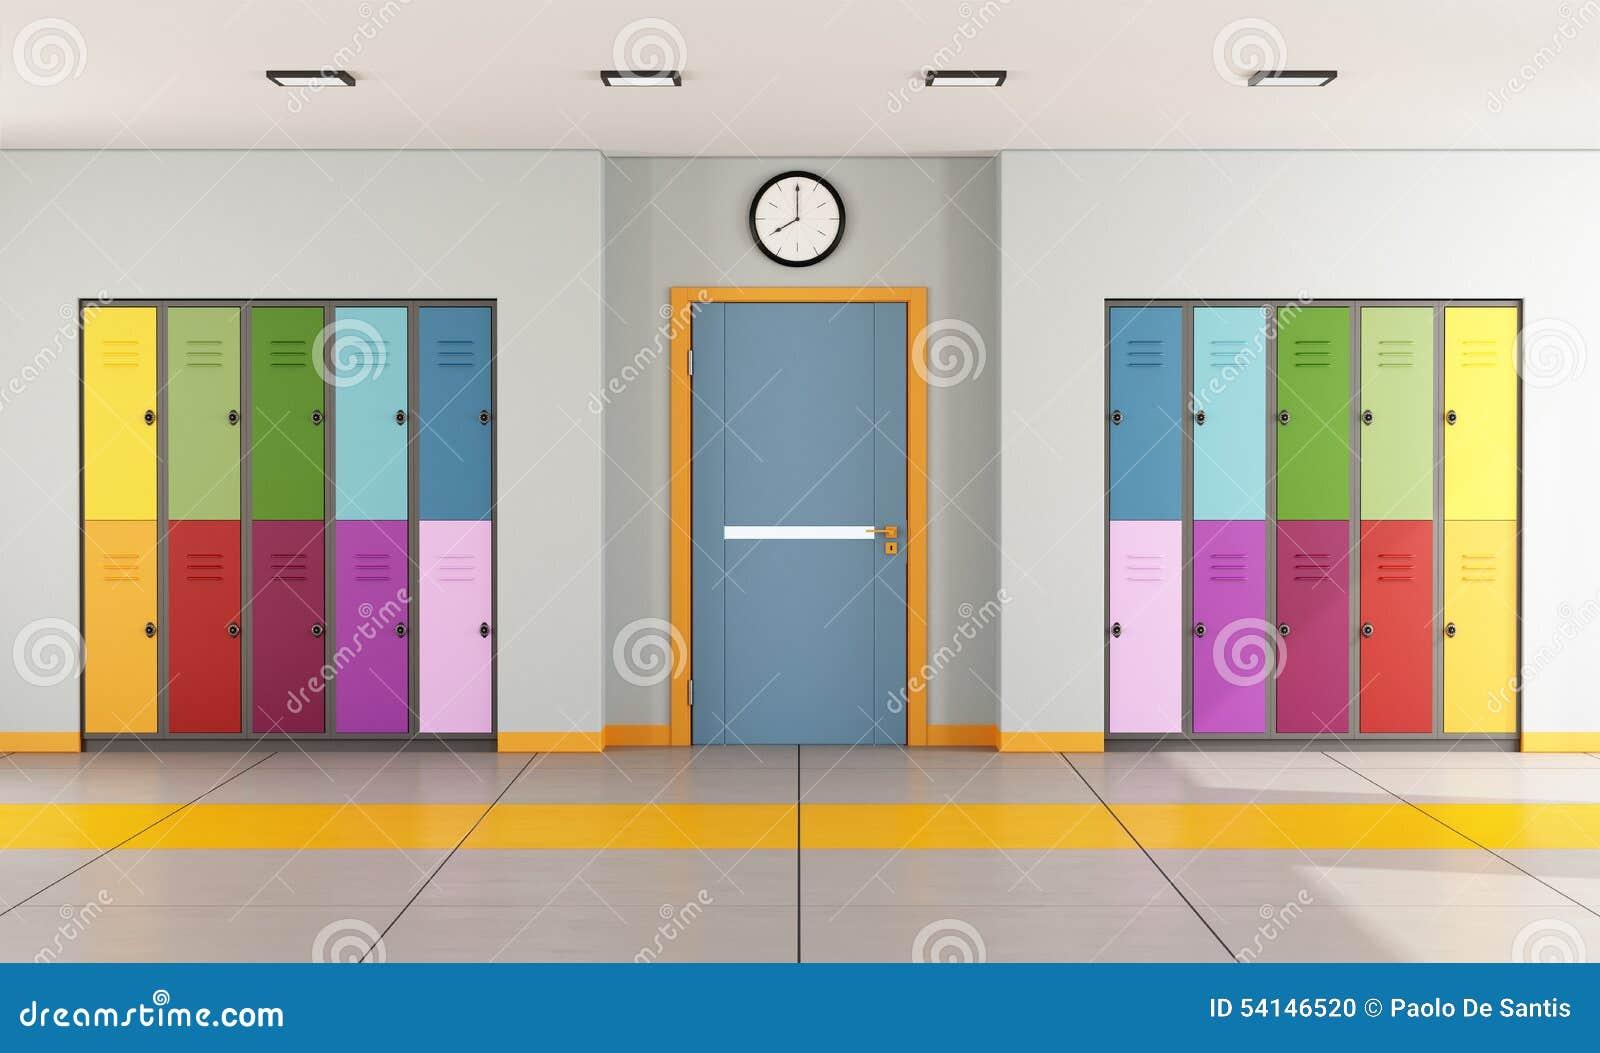 Modern Classroom Vector : School hallway with student lockers stock illustration